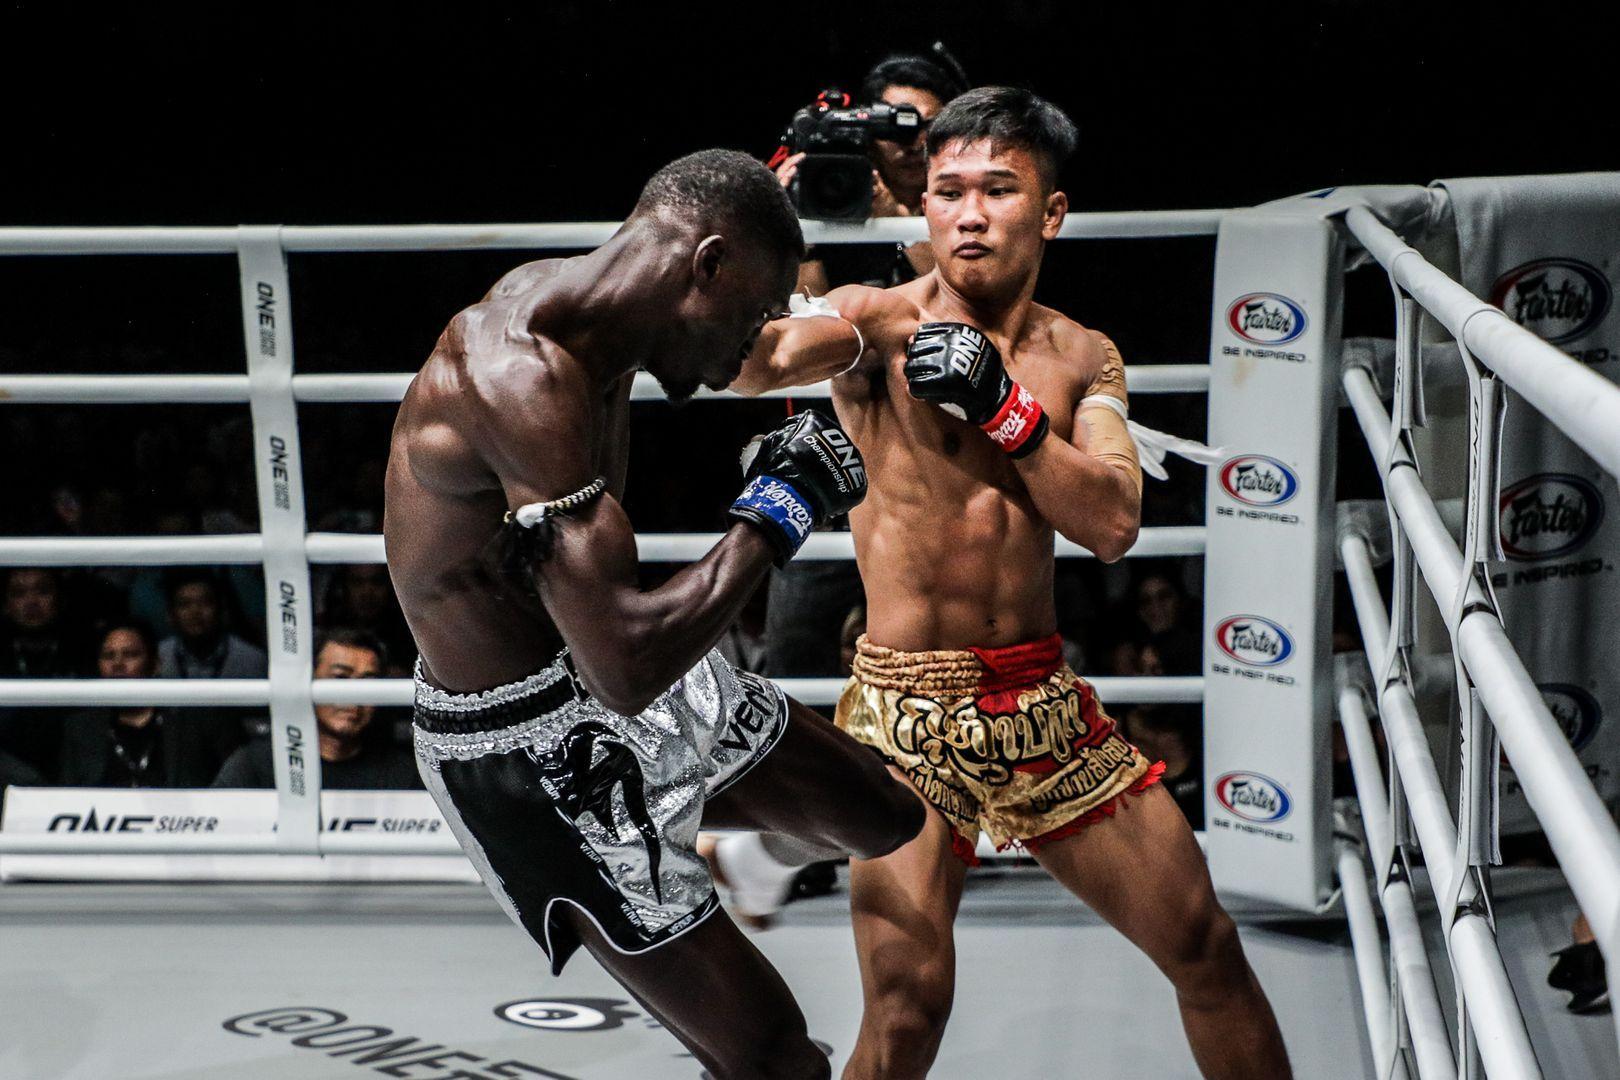 Muay Thai fighter Kulabdam rocks Bobo Sacko